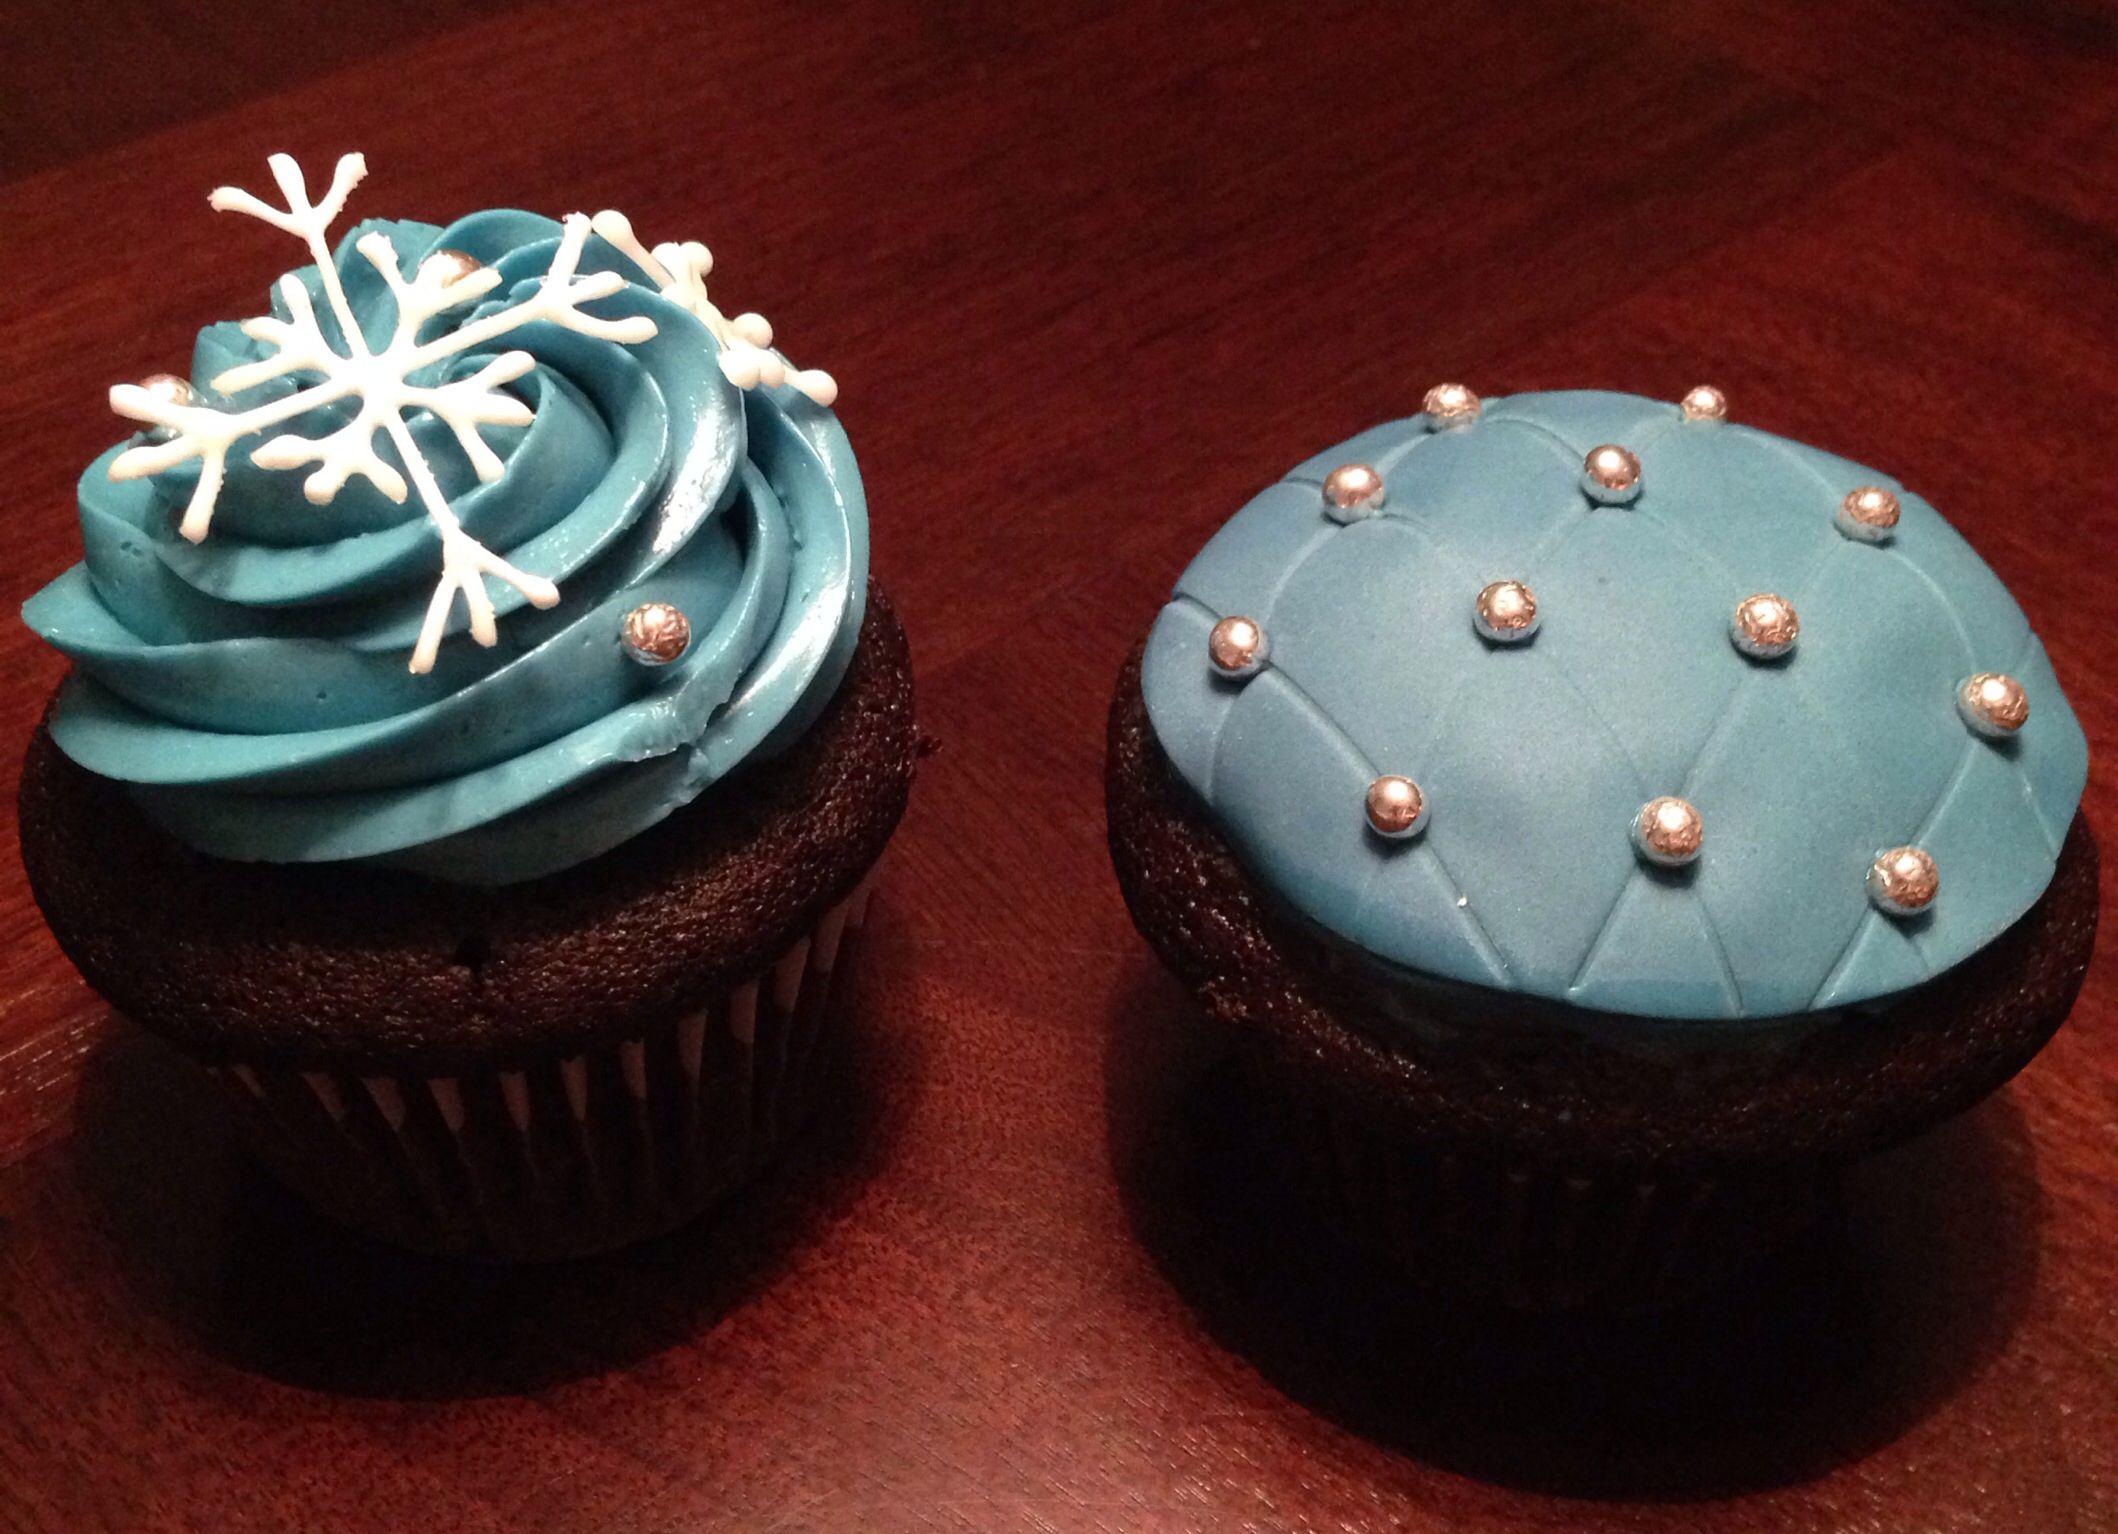 Cake Decorating Ideas Cupcakes : Decorated Winter Cake Ideas 28263 Winter Cupcakes Cake Dec